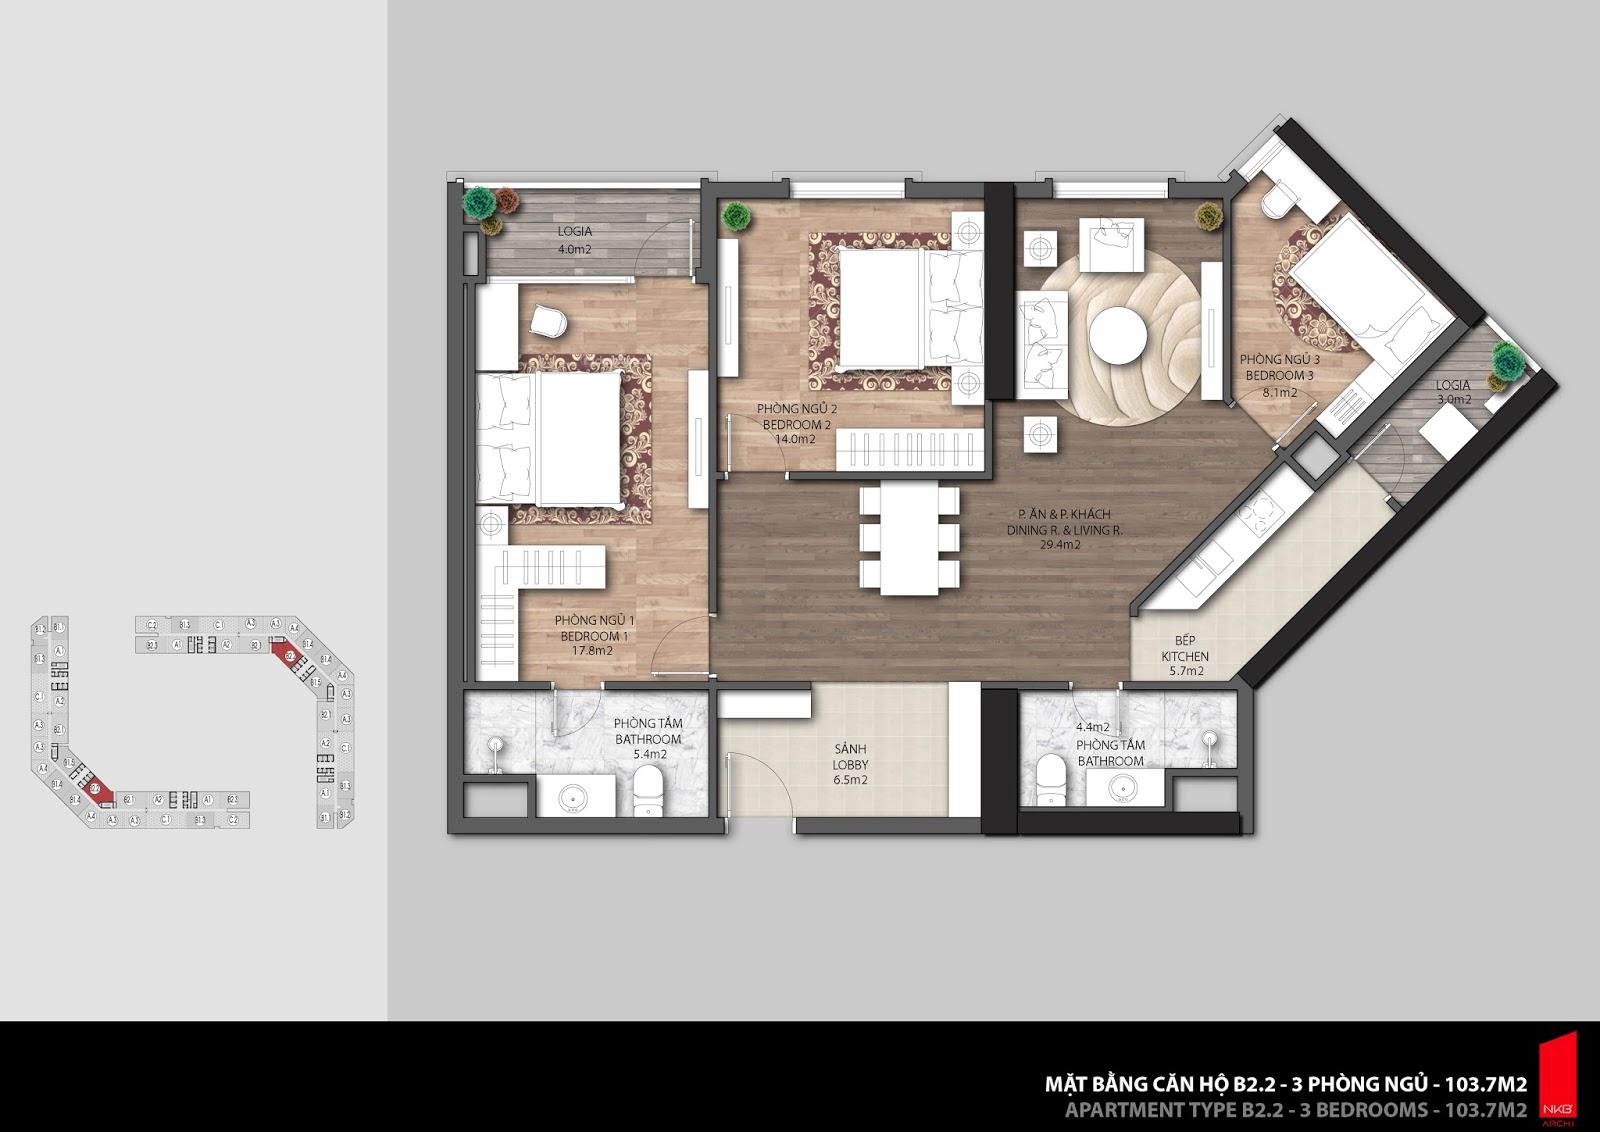 Mặt bằng căn hộ 103,7m2